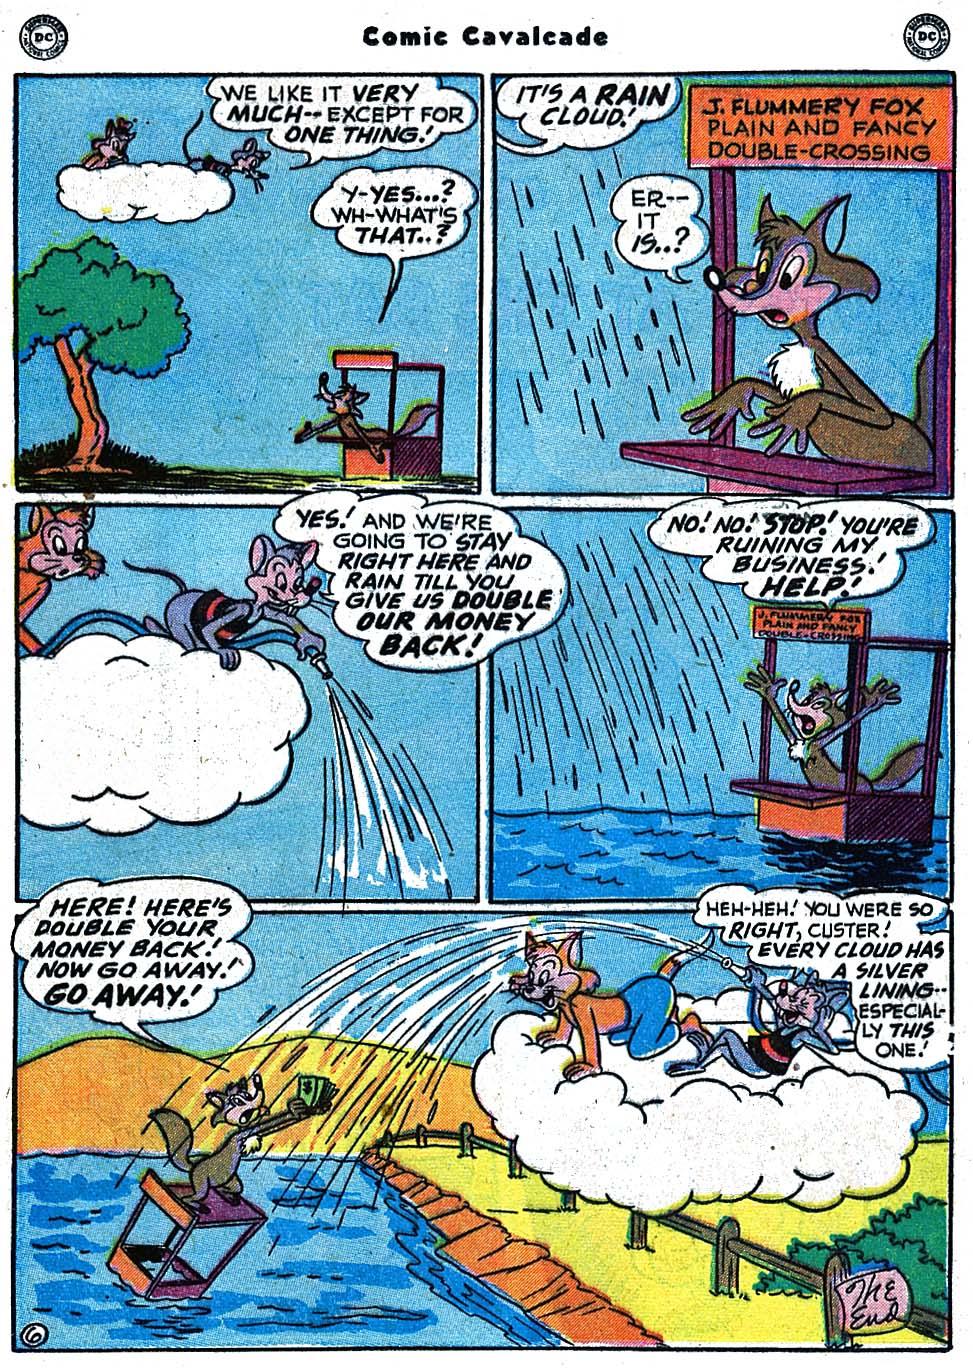 Comic Cavalcade issue 38 - Page 67